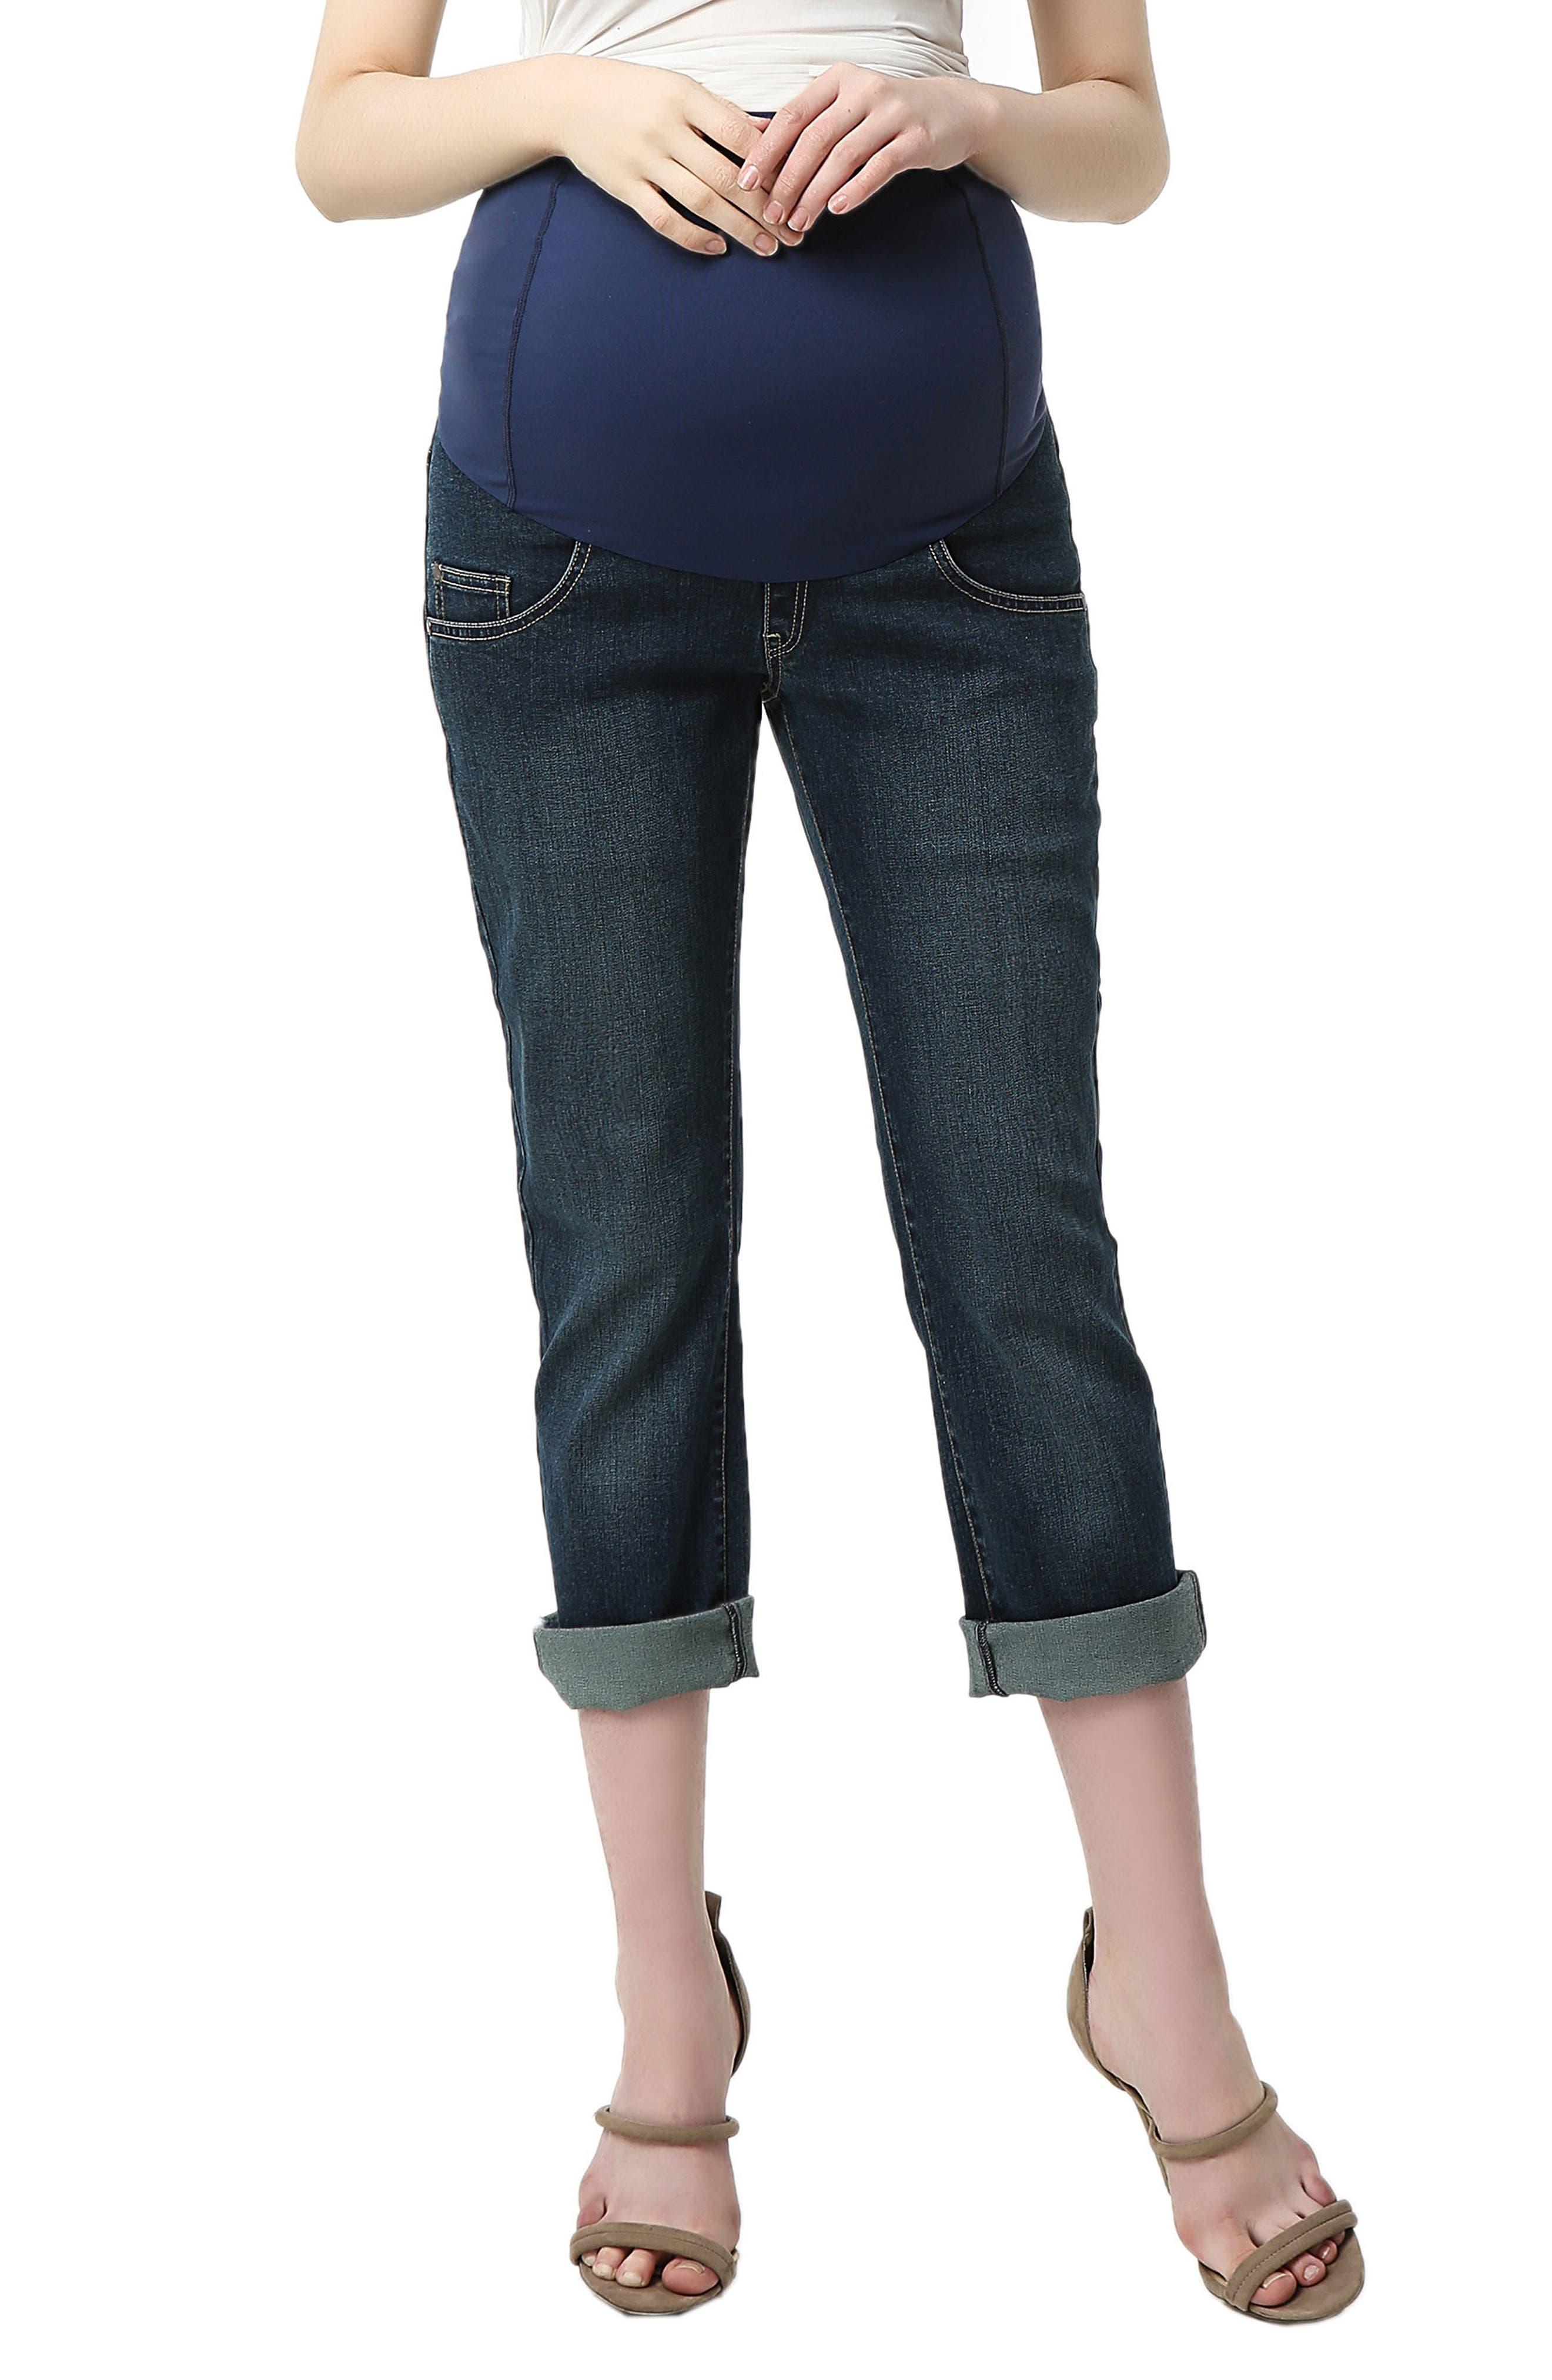 Kimi and Kai Jodie Crop Girlfriend Maternity Jeans